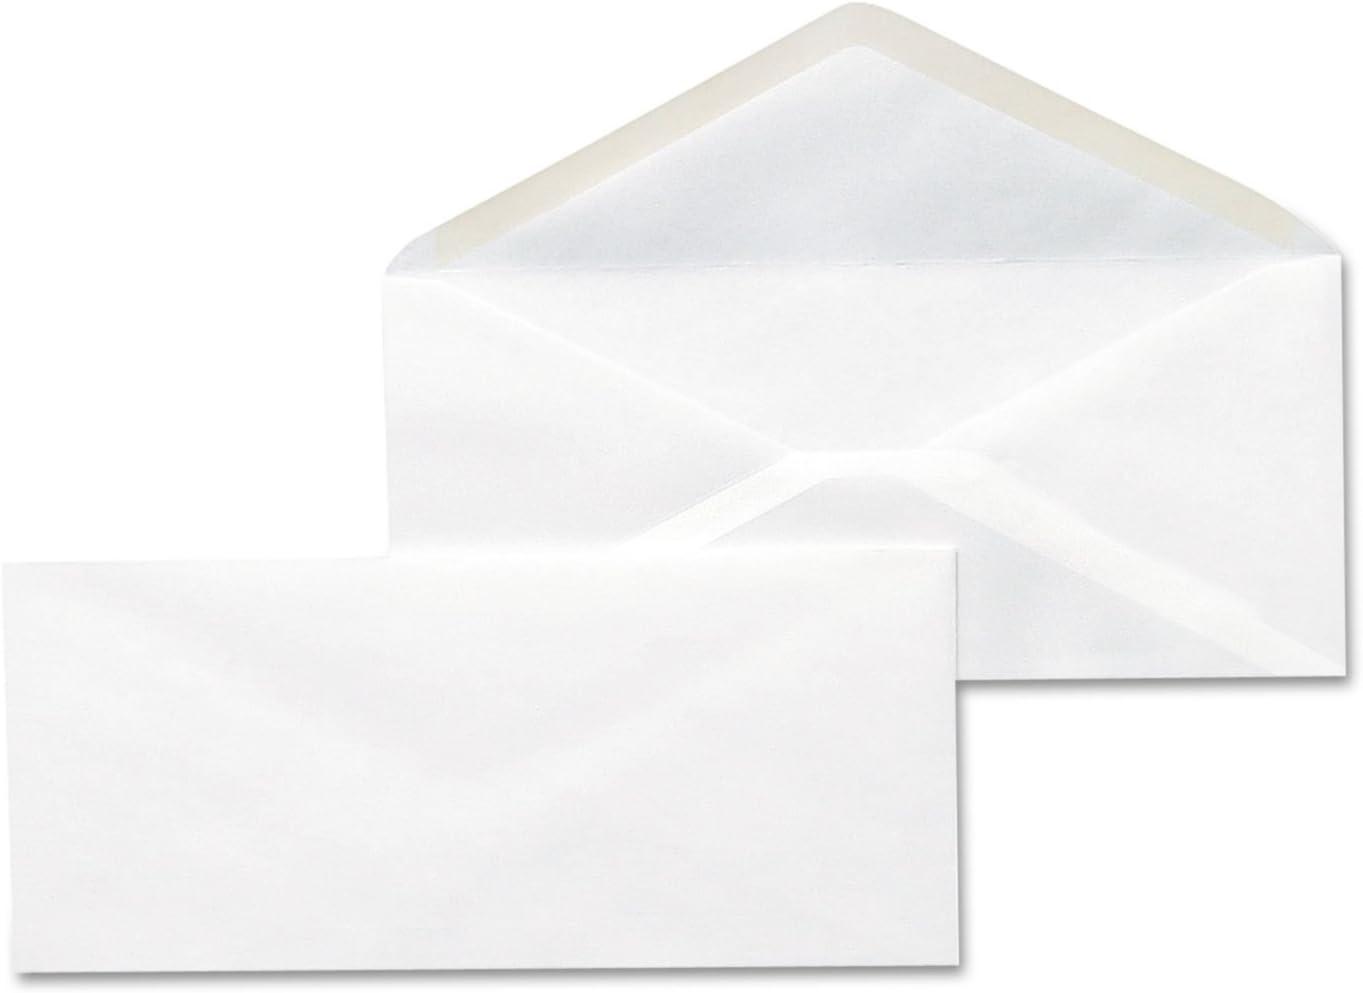 Universal 35210 Business Envelope, 10, 4 1/8 x 9 1/2, White, 500/Box